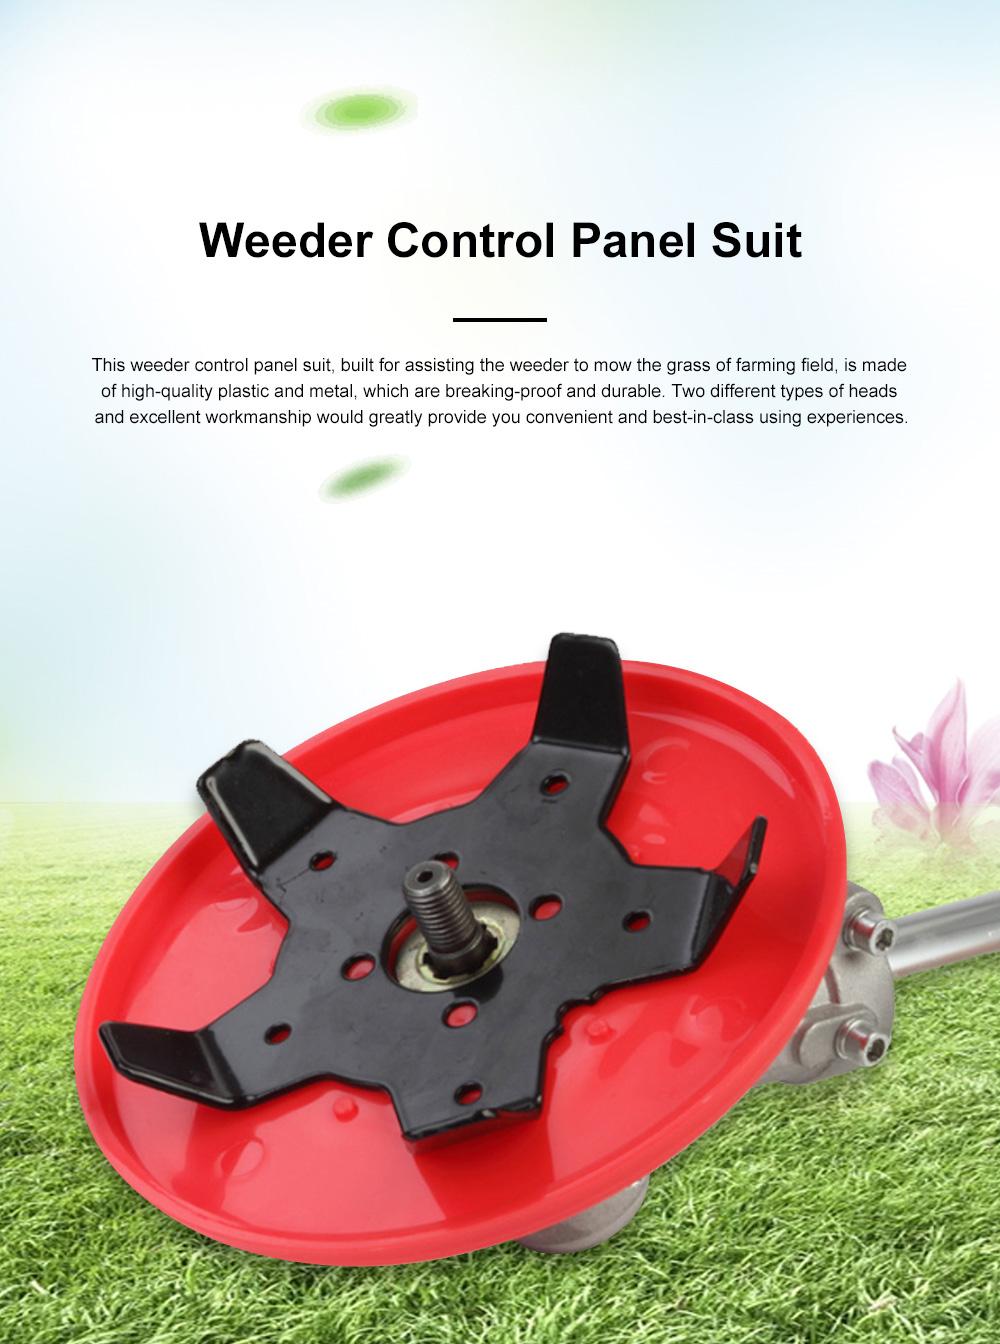 Multifunctional Paddy Field Dry Farm Weeding Machine Weeder Mower Head Eradicator Control Panel Gardening Accessories Suit 0